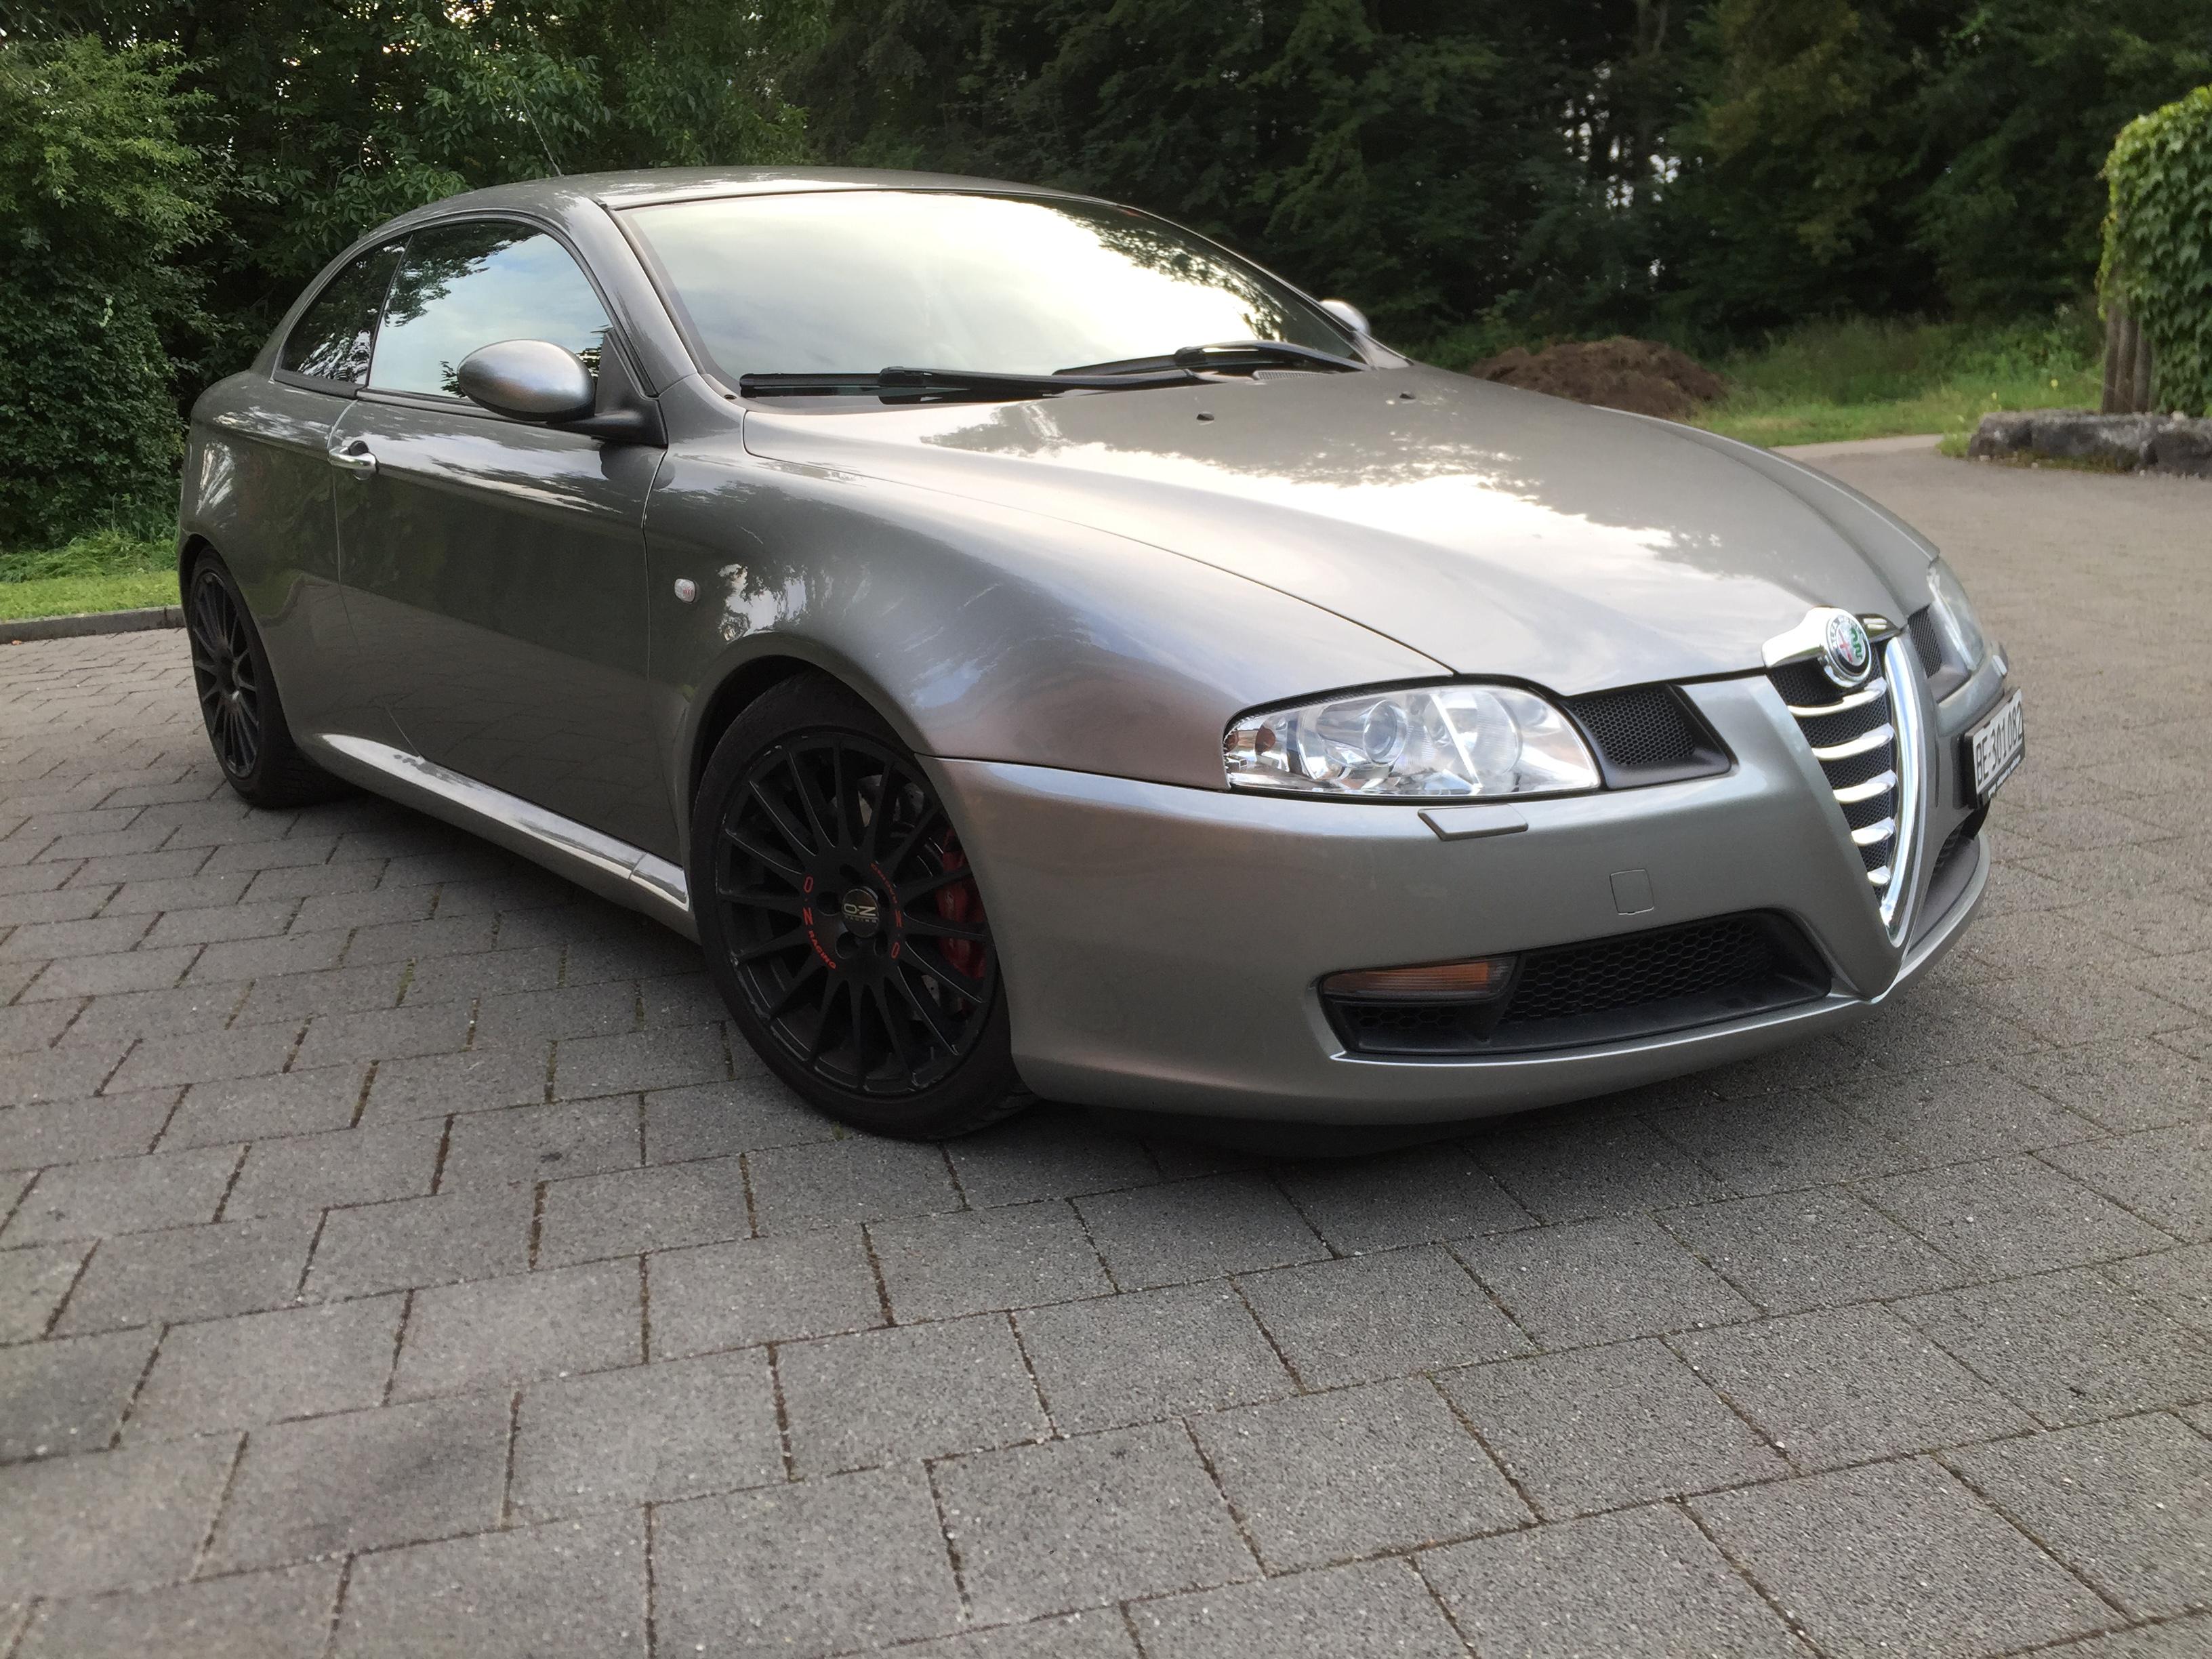 Buy Used Car Coupe Alfa Romeo Gt 3 2 V6 24v Distinctive 168000 Km At 6500 Chf On Carforyou Ch